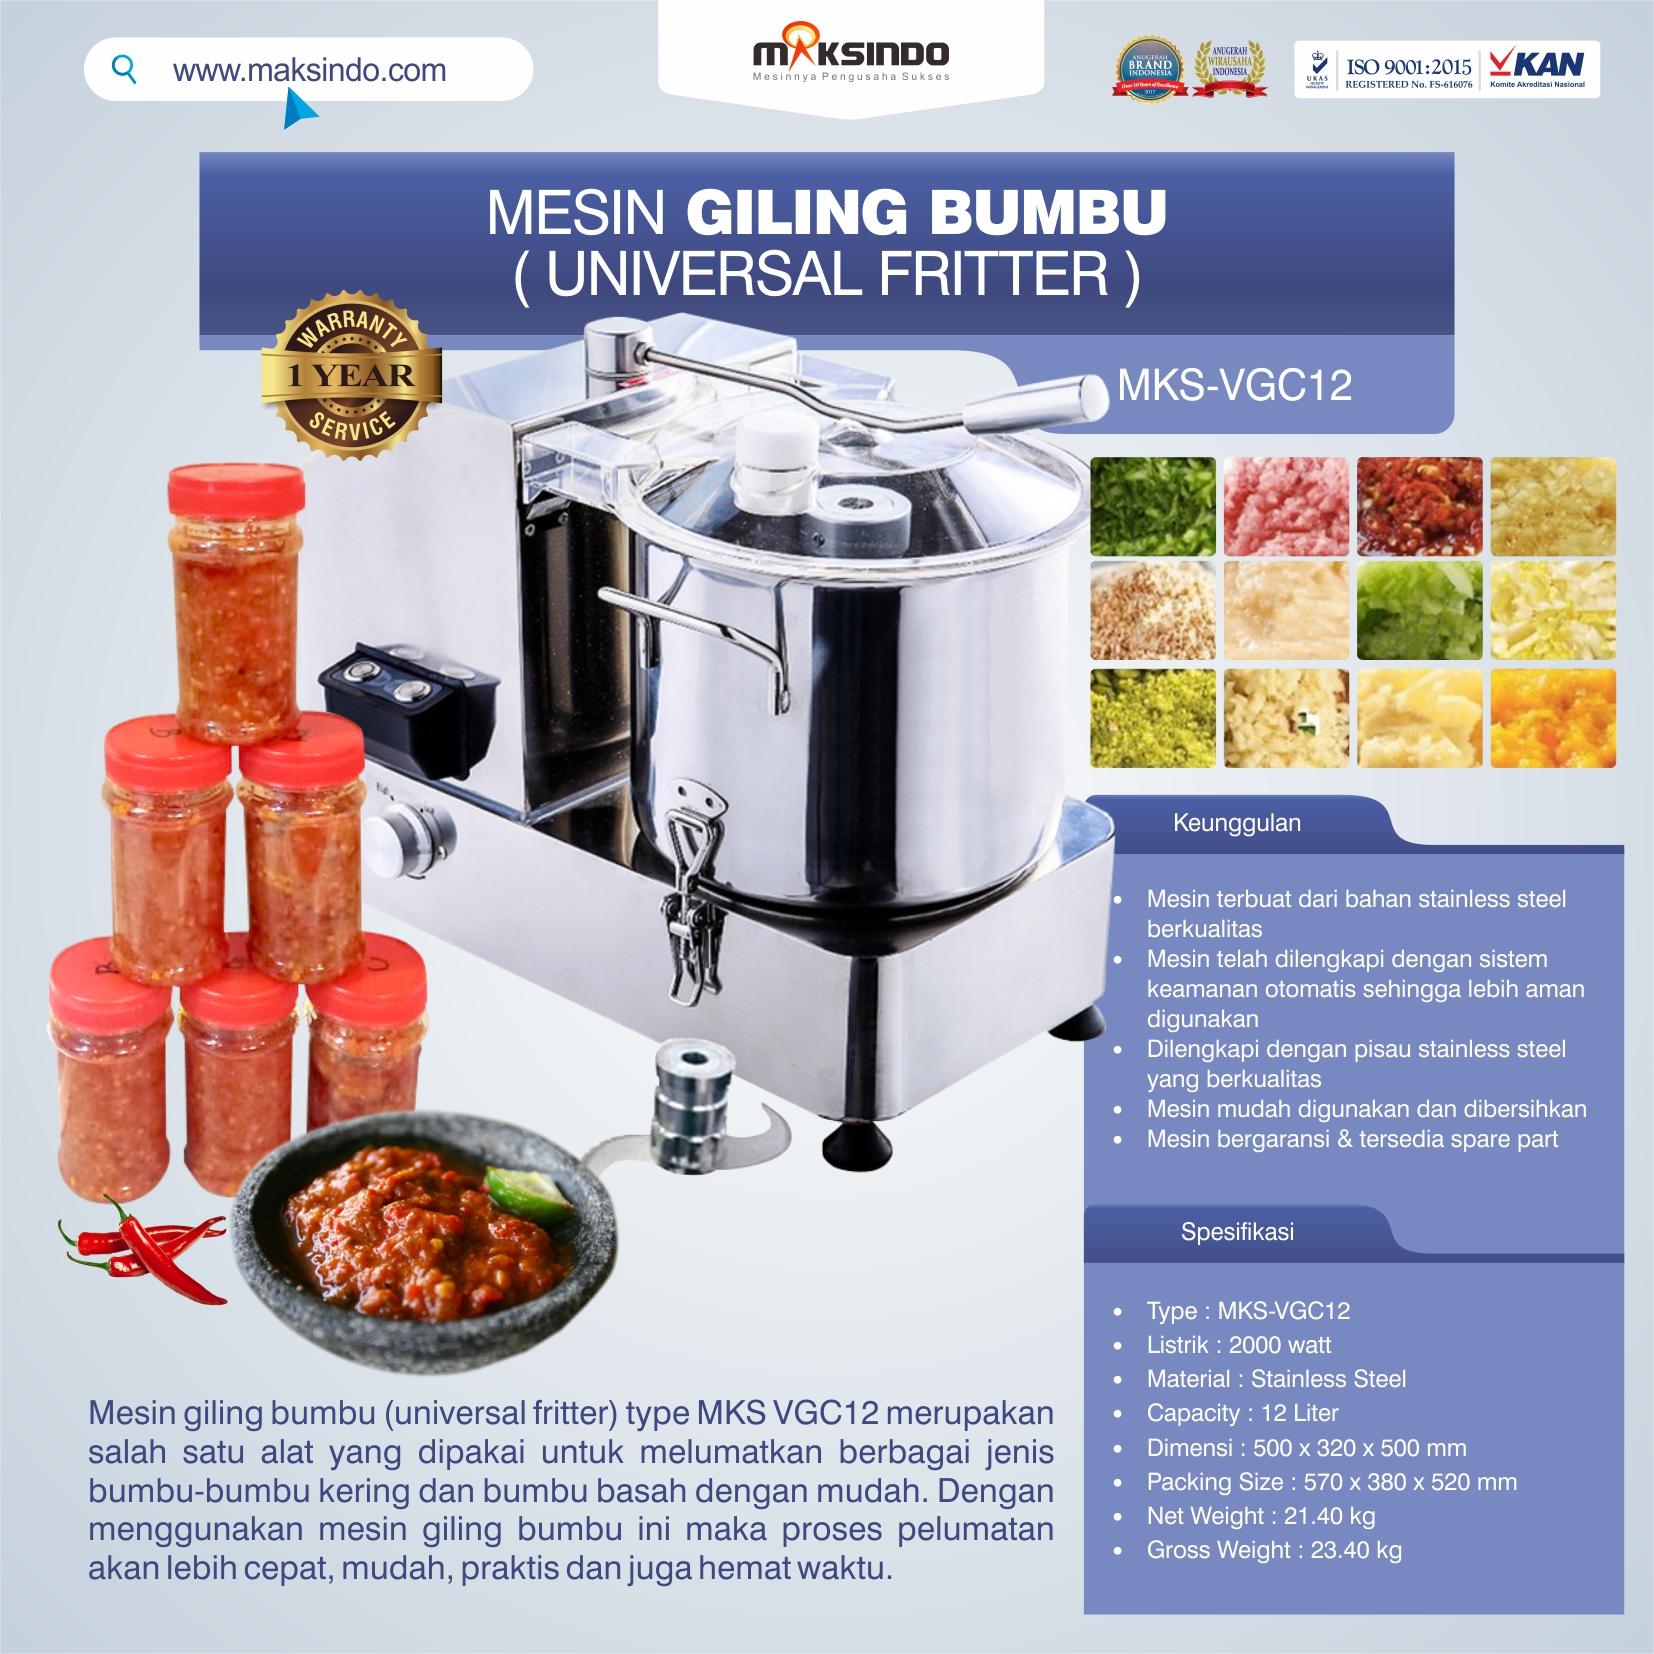 Jual Mesin Giling Bumbu (Universal Fritter) MKS VGC12 di Tangerang